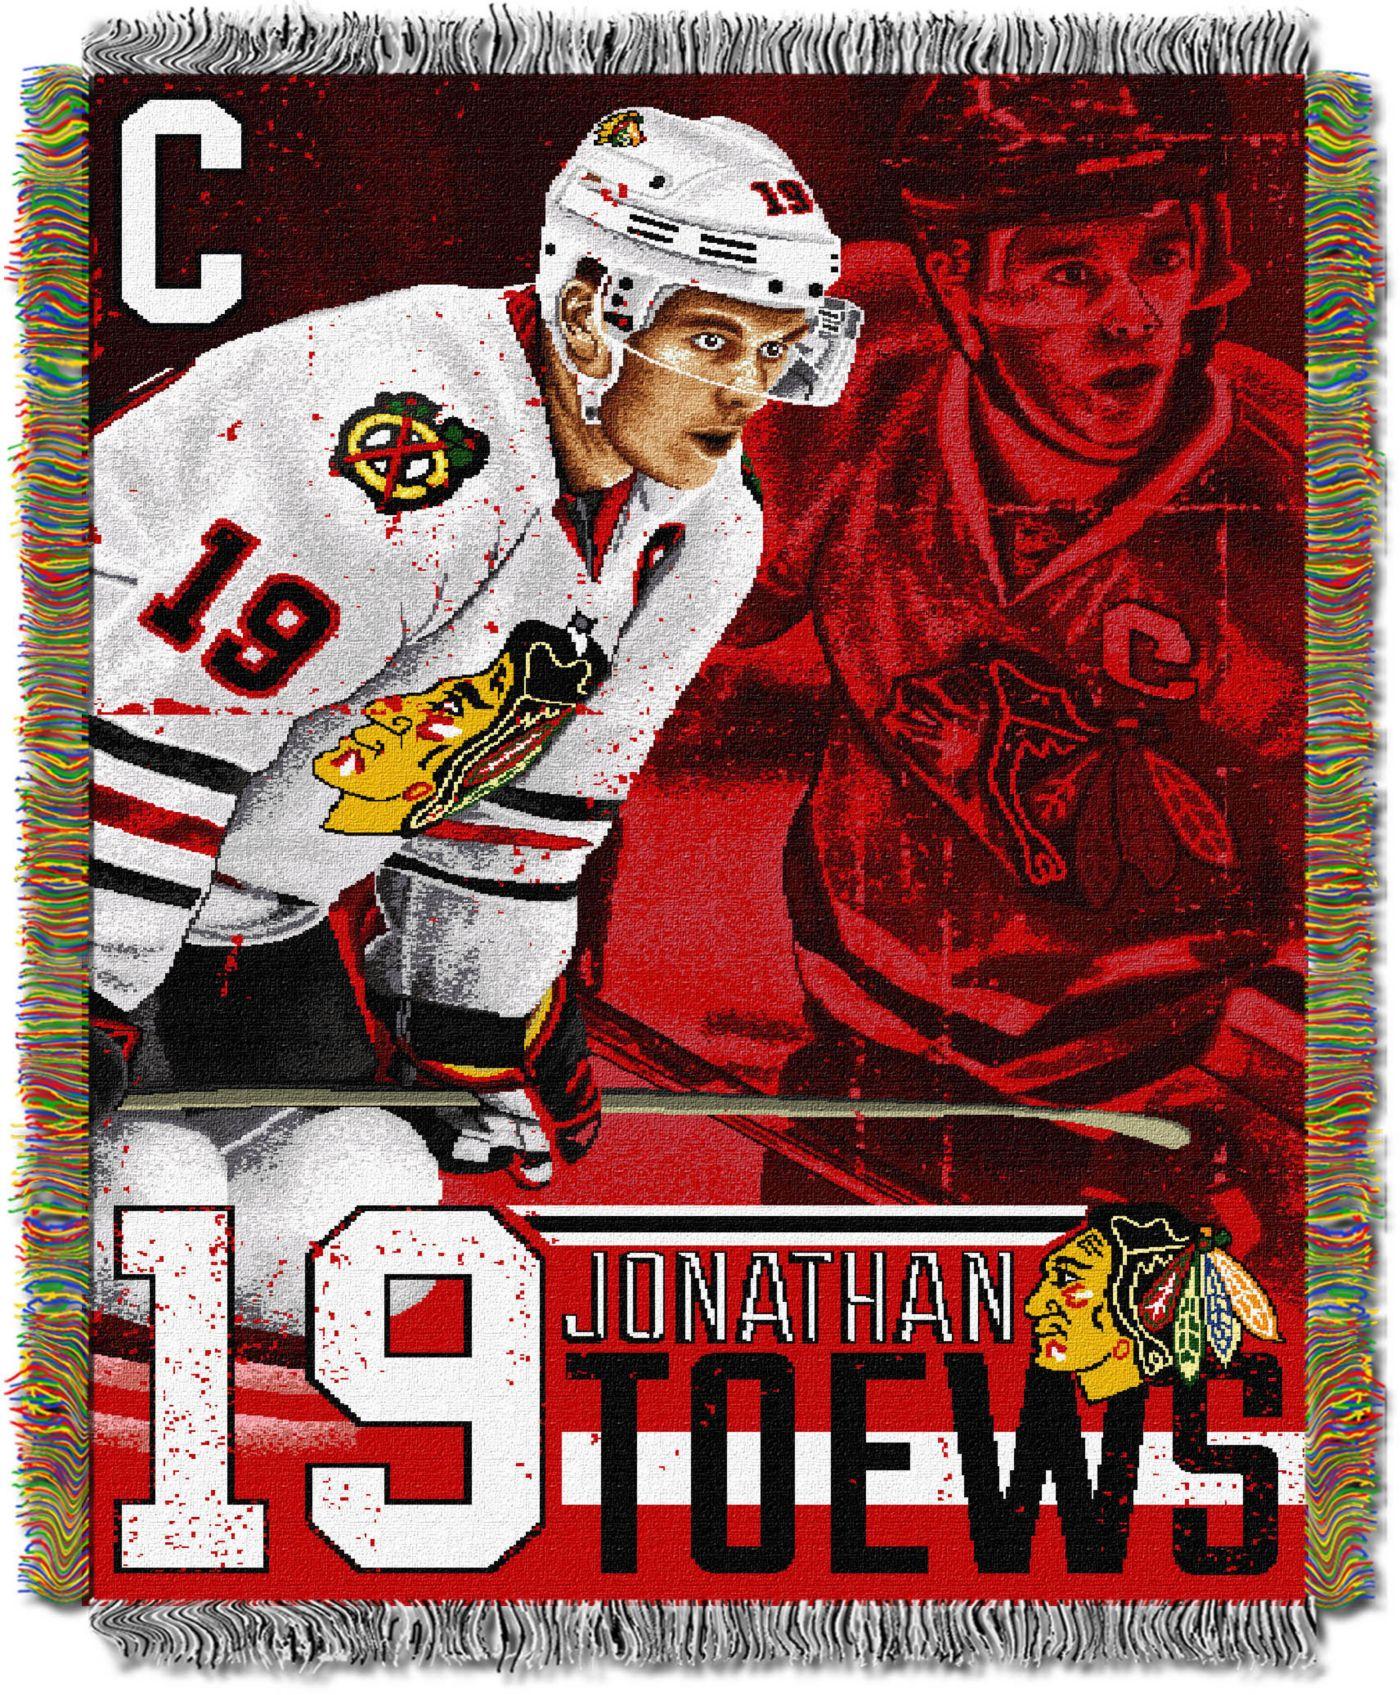 Northwest Chicago Blackhawks Jonathan Toews #19  Tapestry Throw 48 in x 60 in Blanket